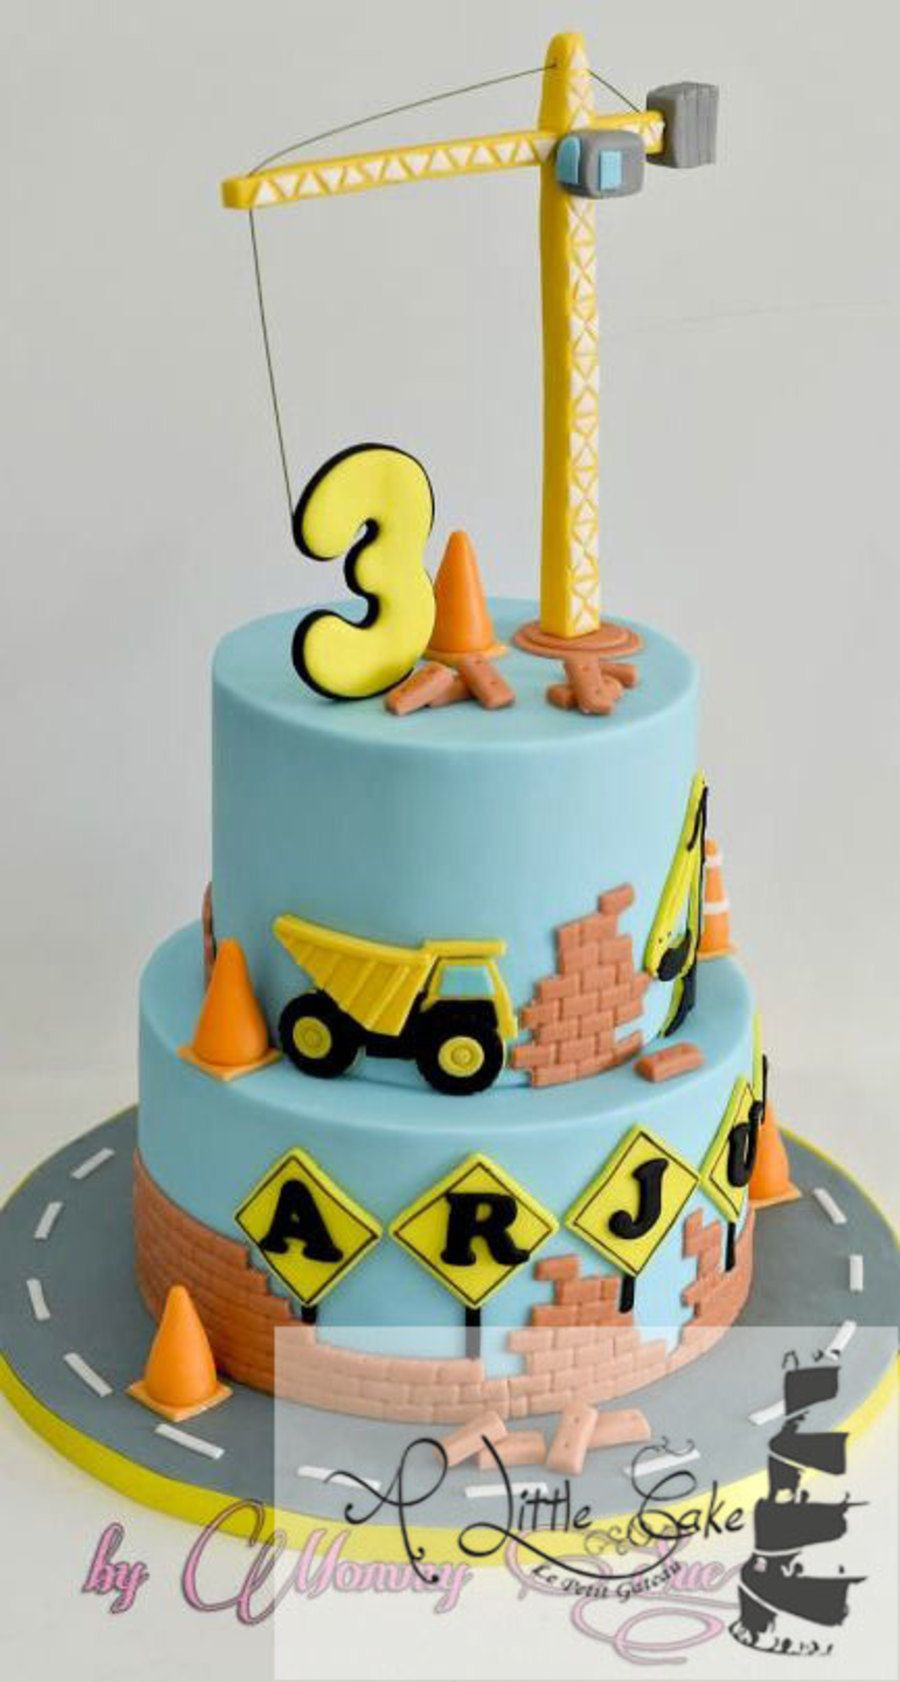 Http://www.alittlecake.com/category/theme Cakes